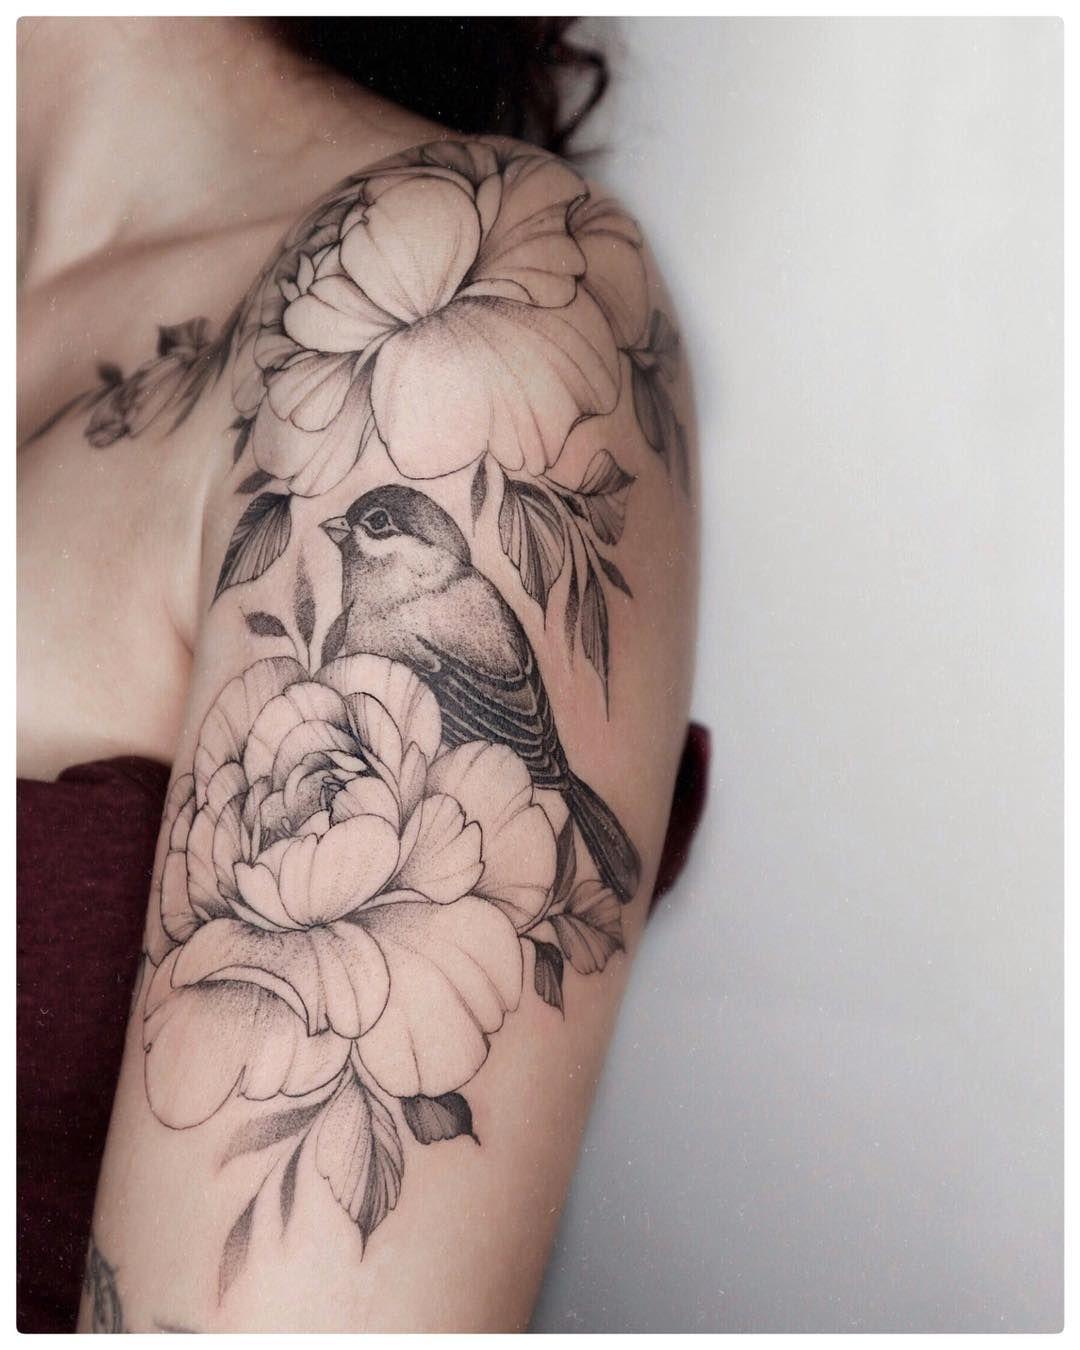 Yarina 🖤 tattoo designer on Instagram: